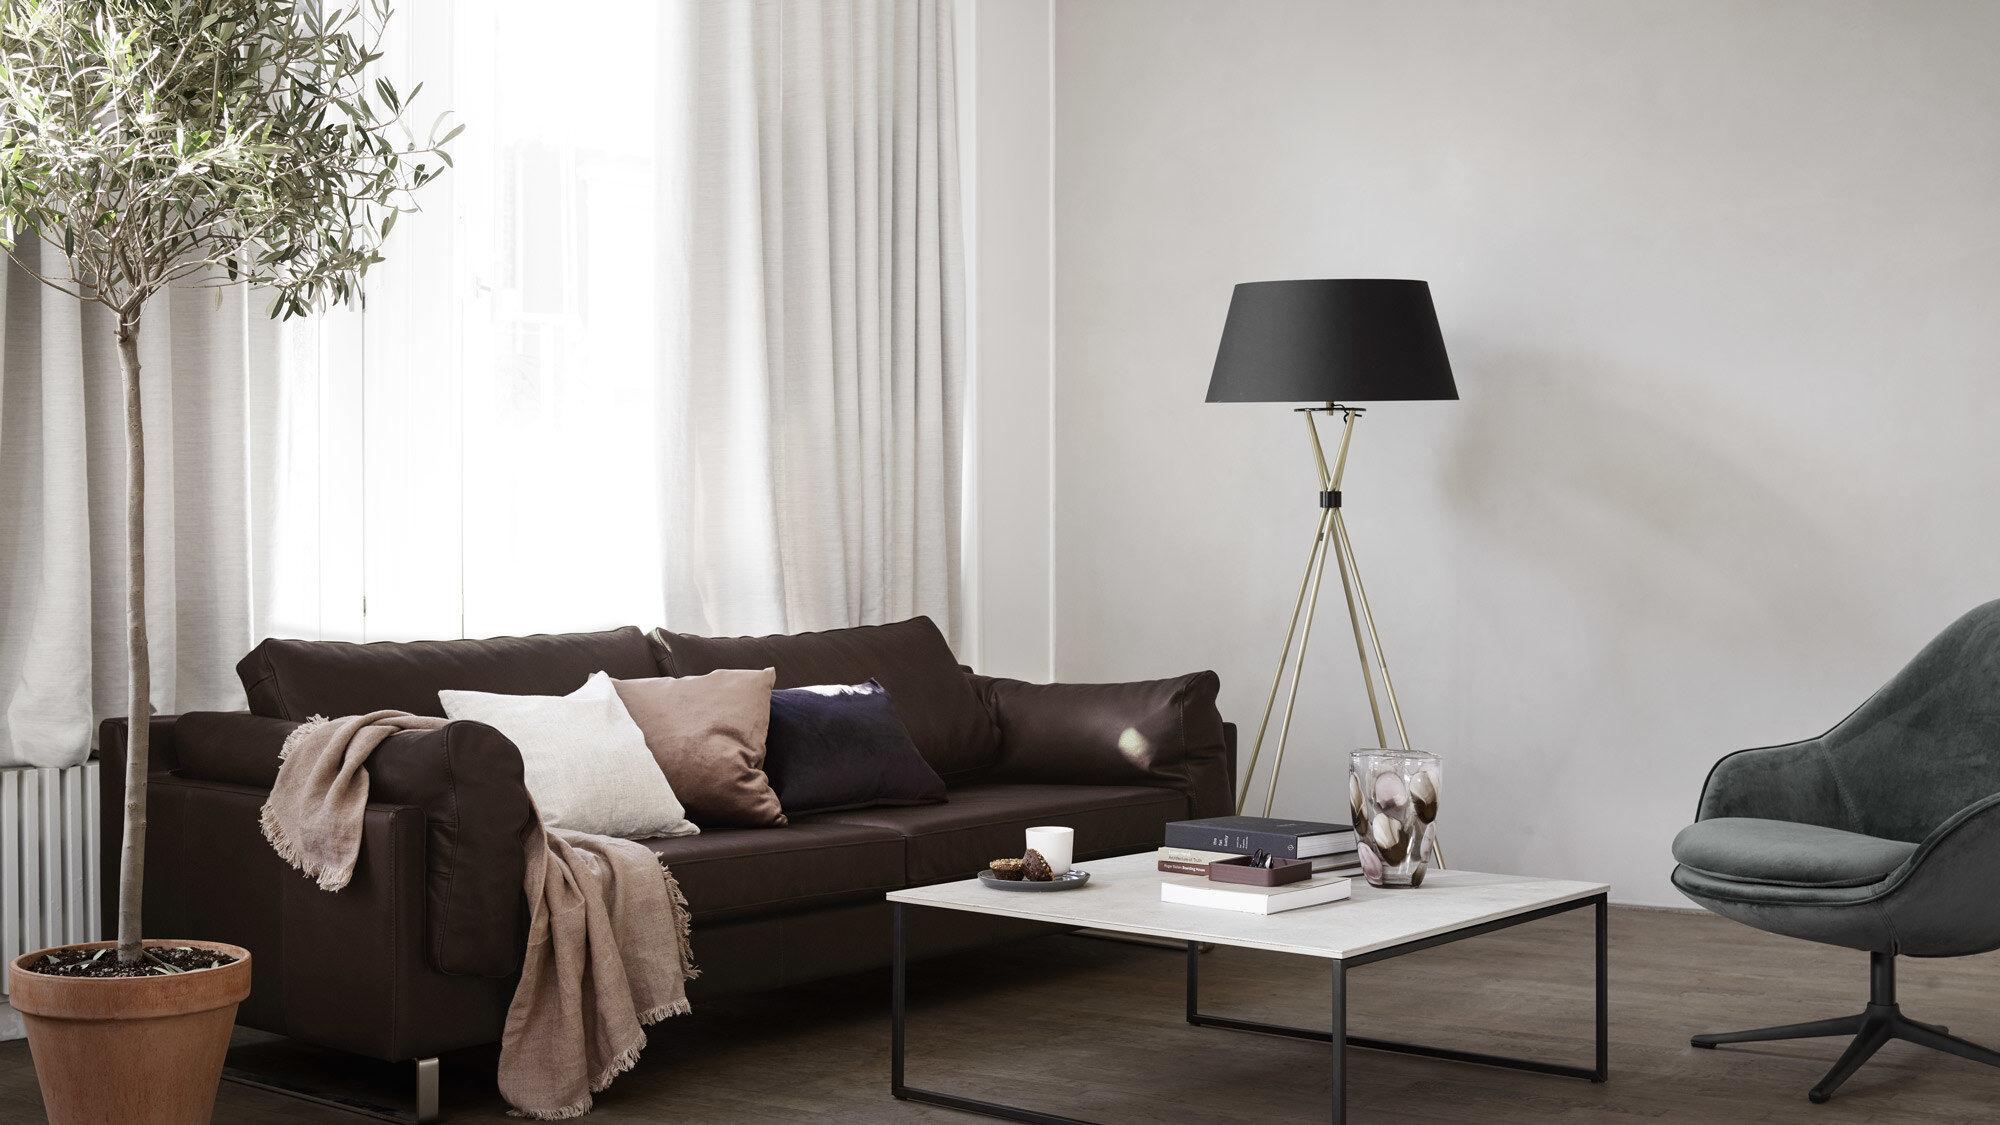 Lamps - Kip floor lamp